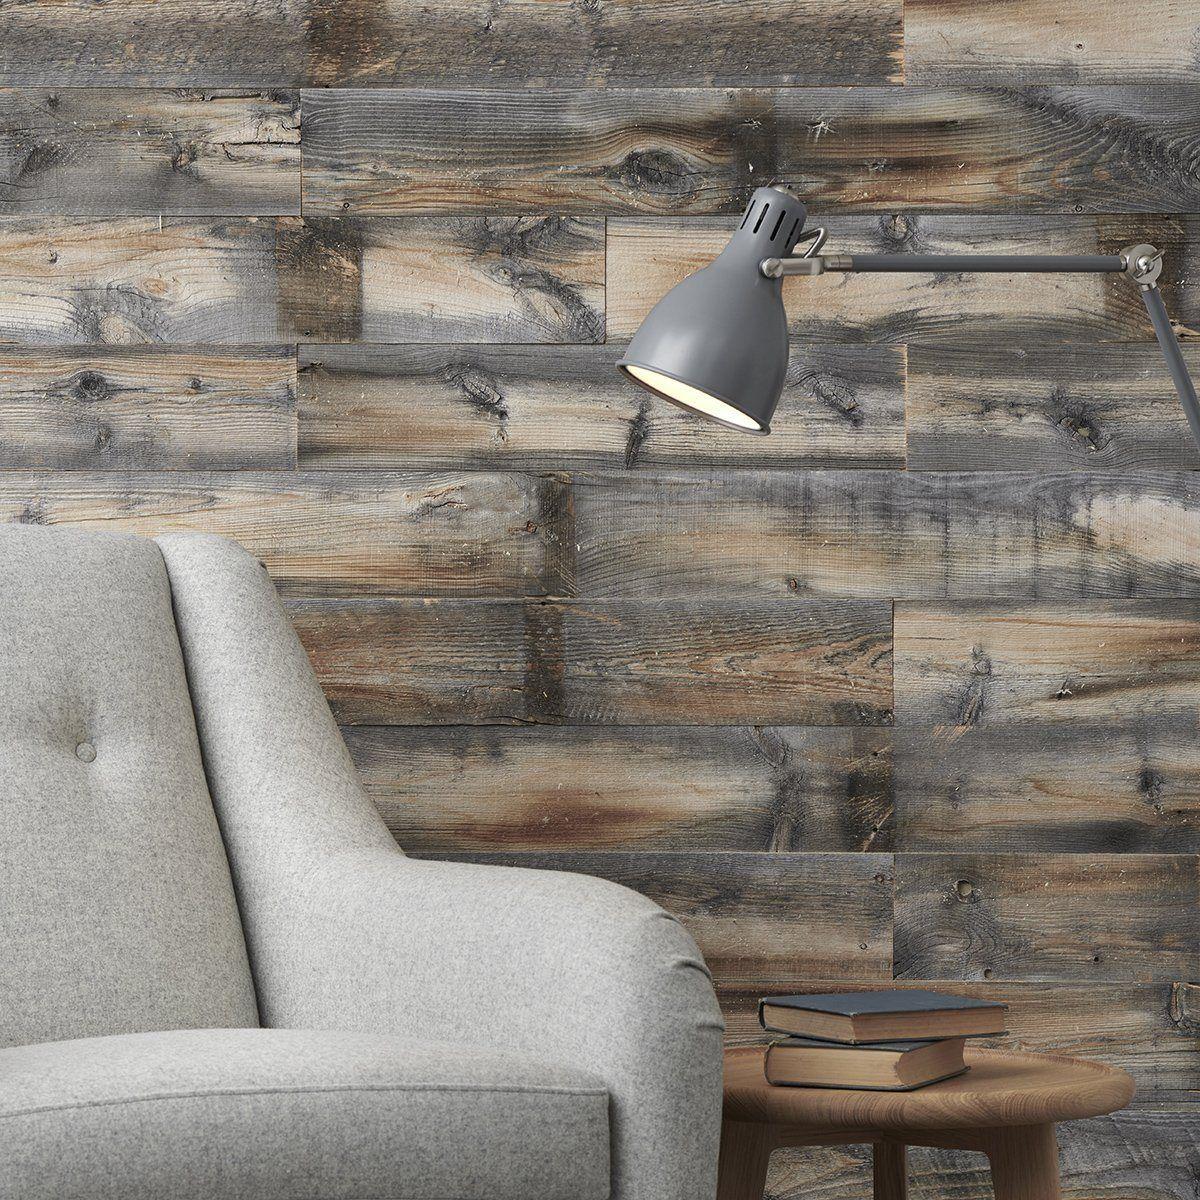 Rustic Grey Wood Wall Panelling Rustic Weathered Reclaimed Wood Wall In 2020 Wood Panel Walls Reclaimed Wood Wall Reclaimed Wood Wall Panels